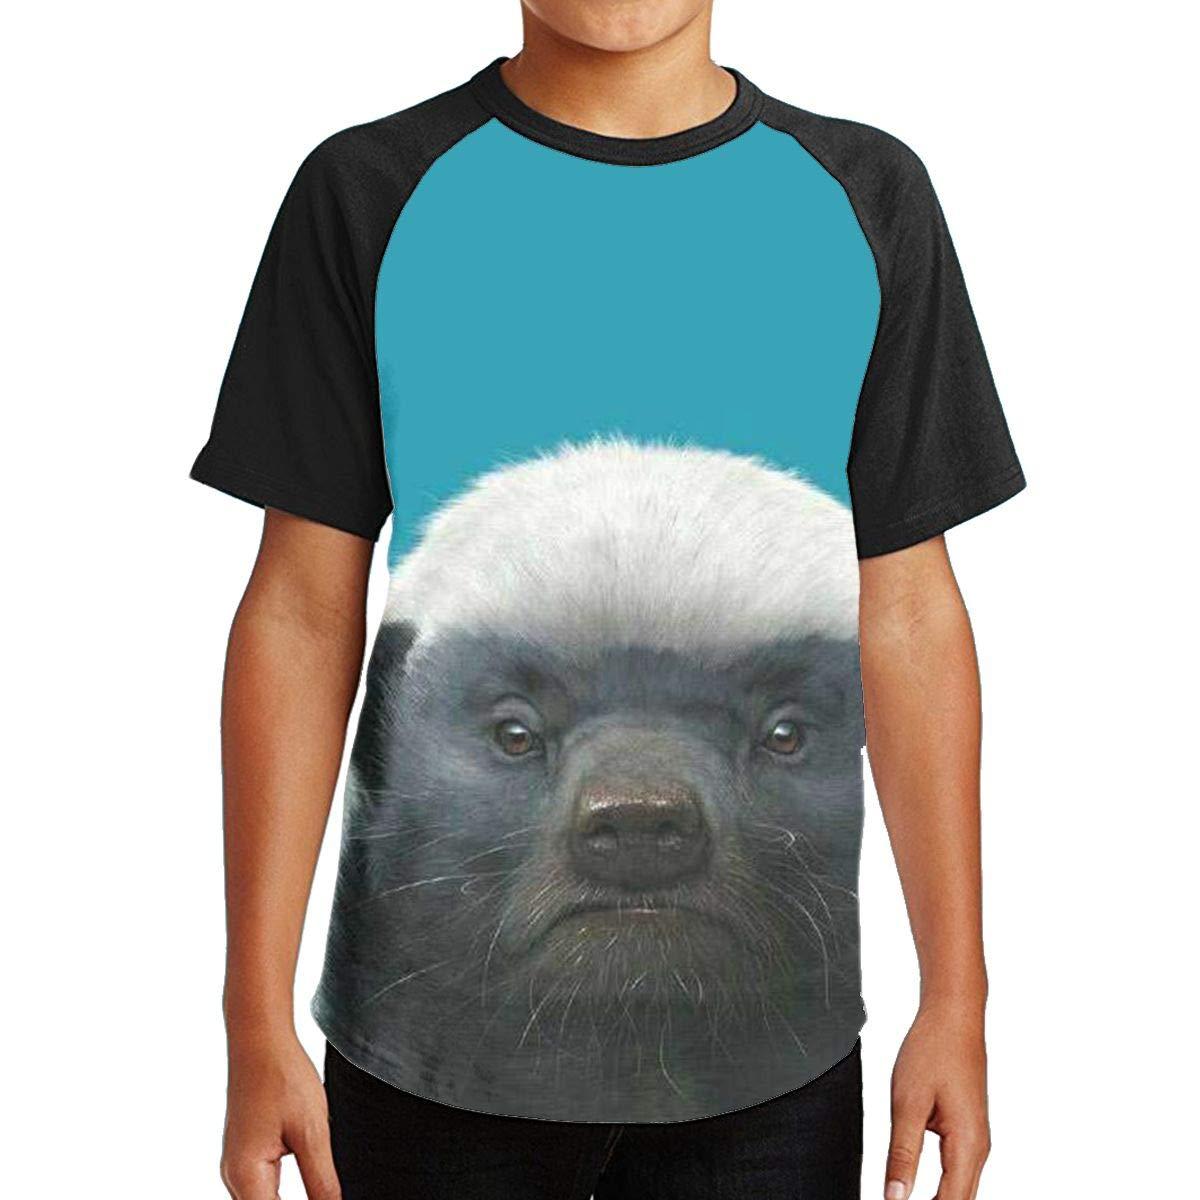 98b9c0ba1c898 Amazon.com: Youth 3D Print Short Sleeve Tee Bored Honey Badger Kids ...